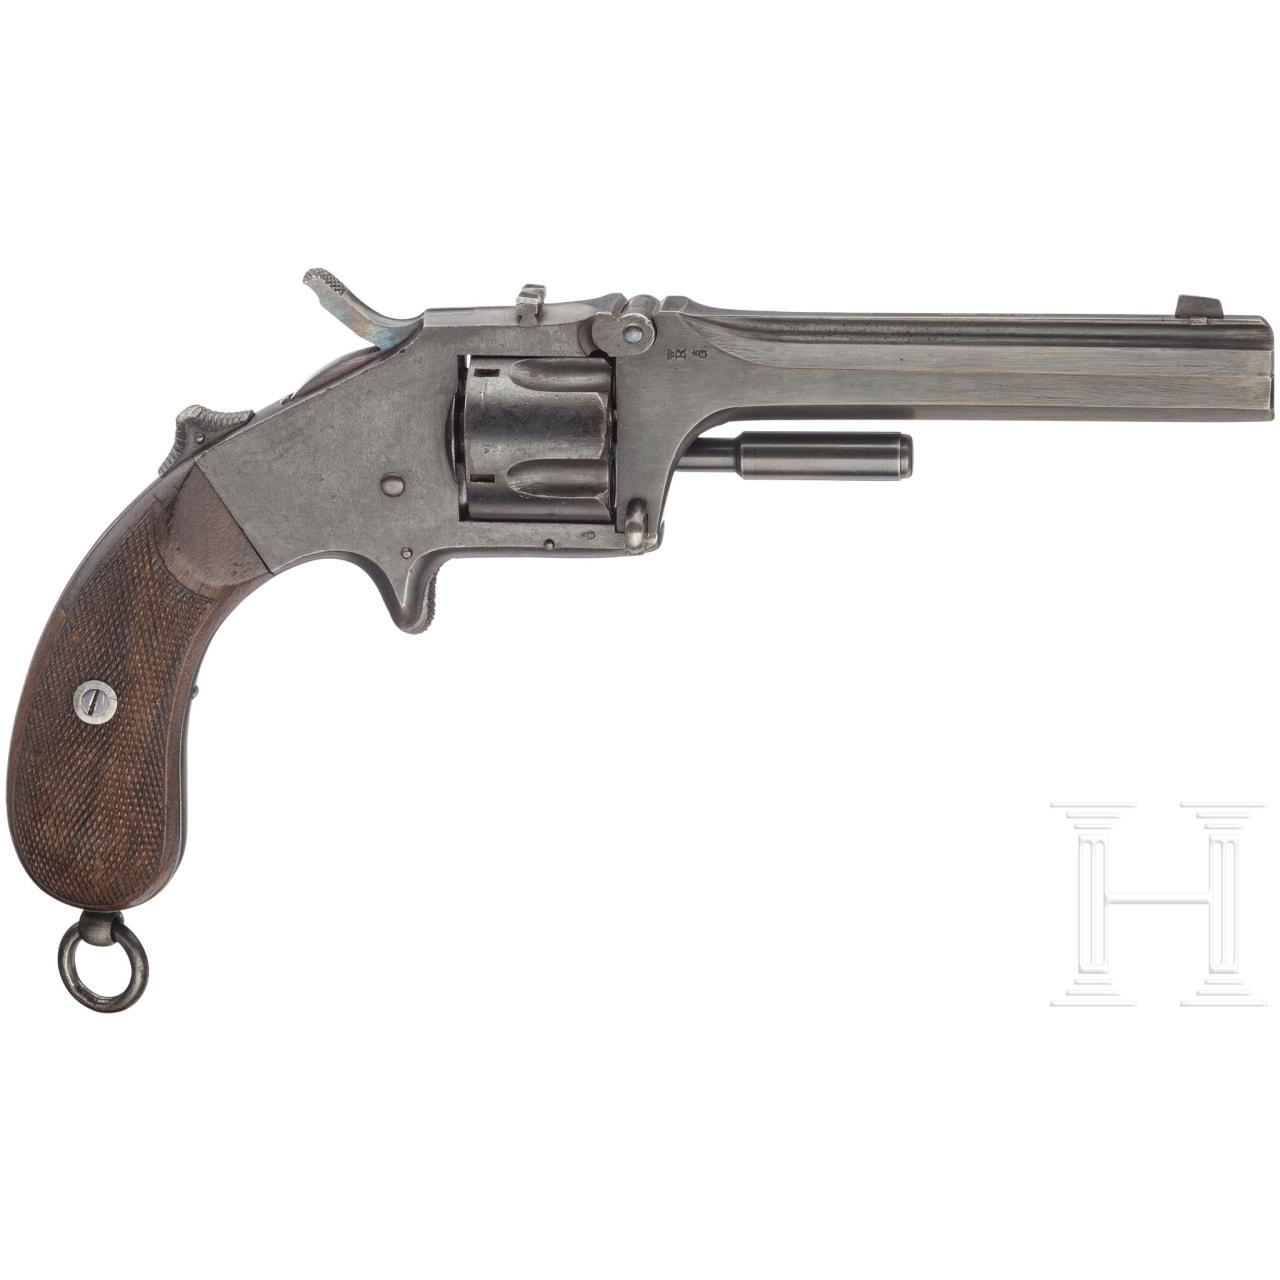 A Model 1873 ordnance revolver